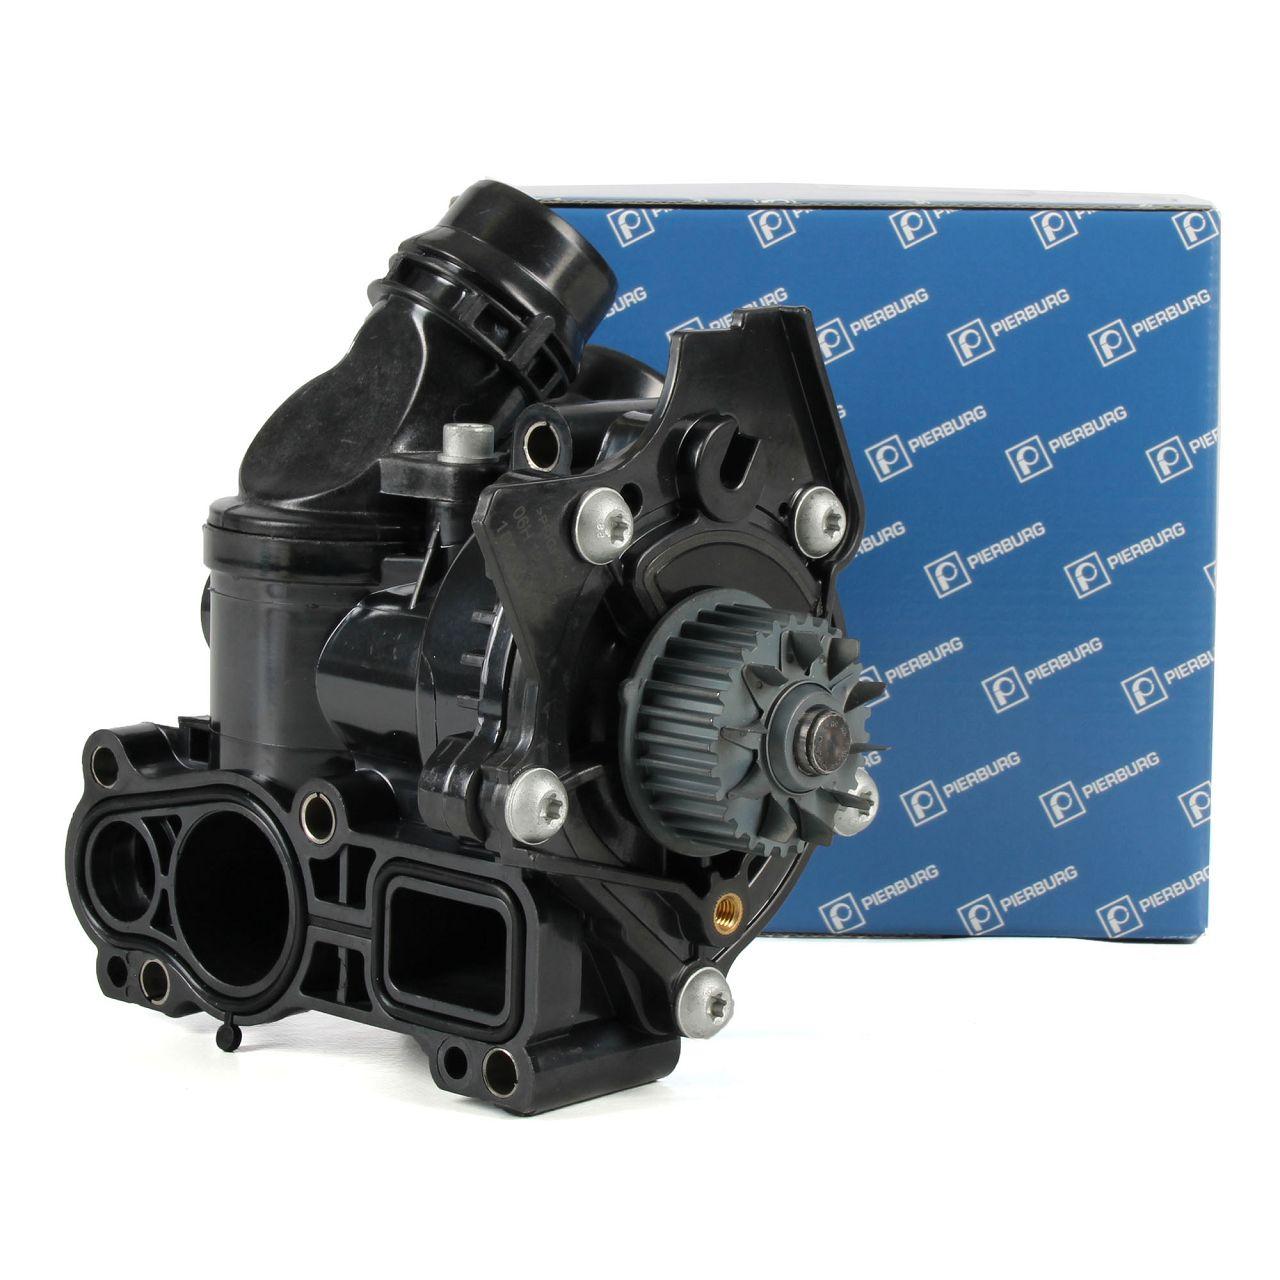 PIERBURG Kühl- Wasserpumpe + Thermostat für AUDI SEAT SKODA VW 1.8 TFSI 2.0 TFSI